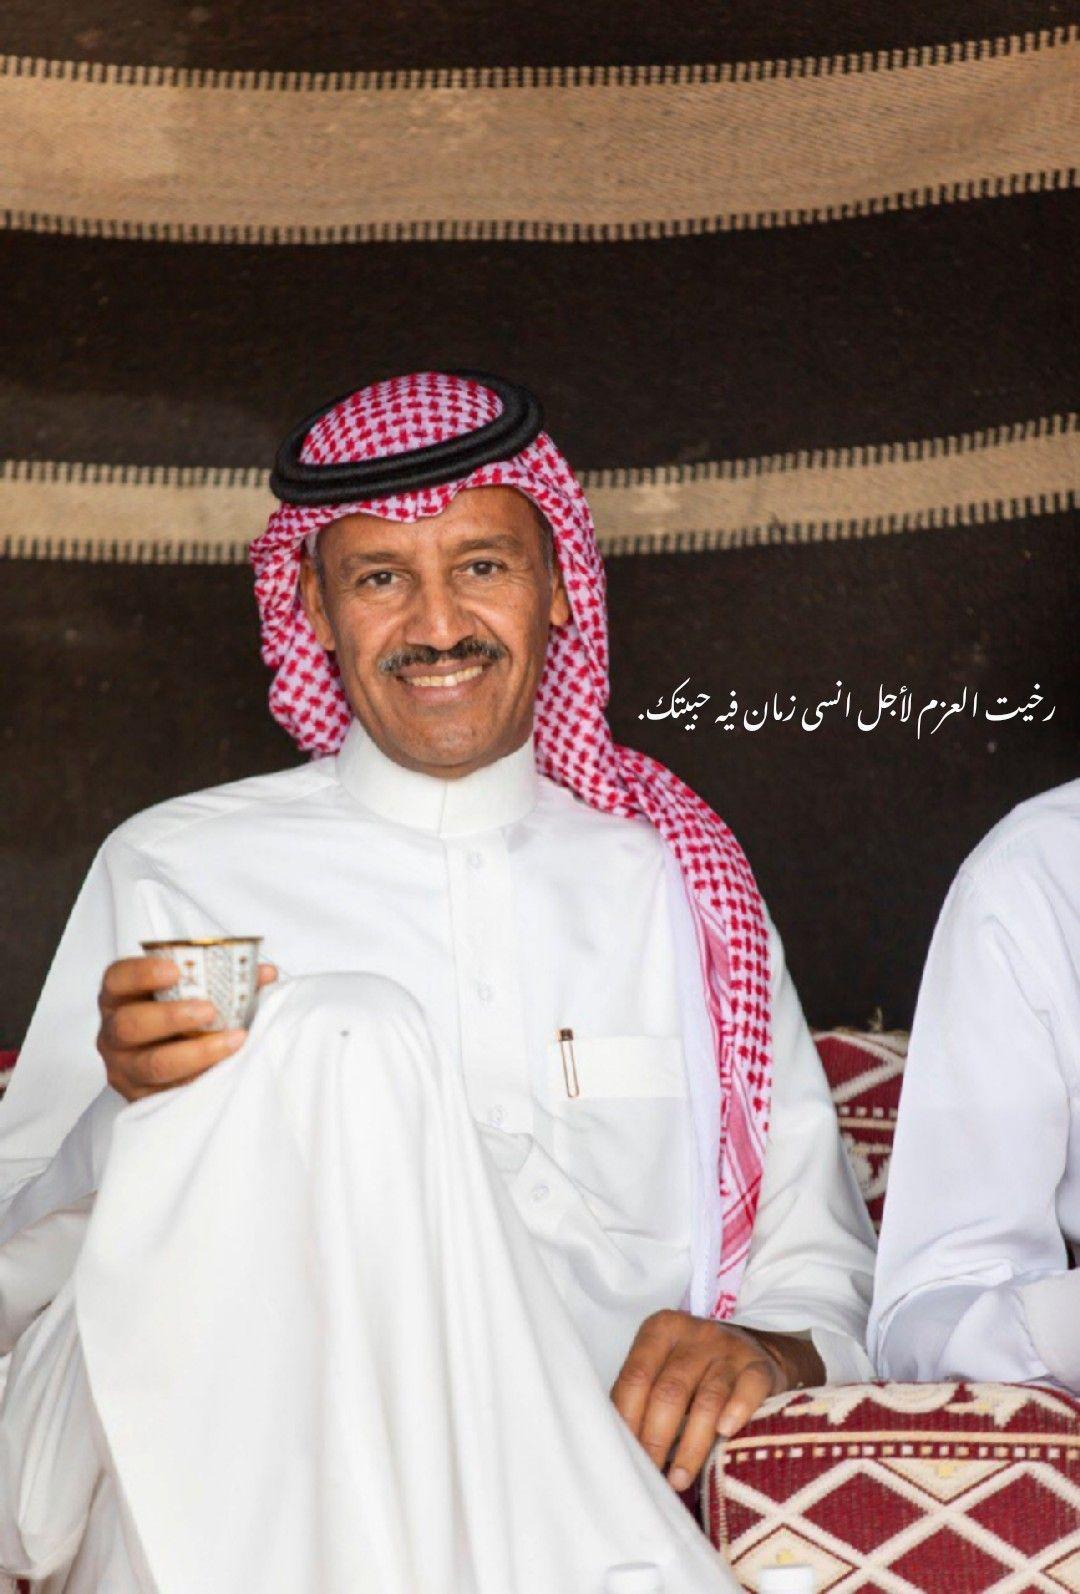 أبو نايف Cute Selfie Ideas Calligraphy Quotes Love Beautiful Arabic Words